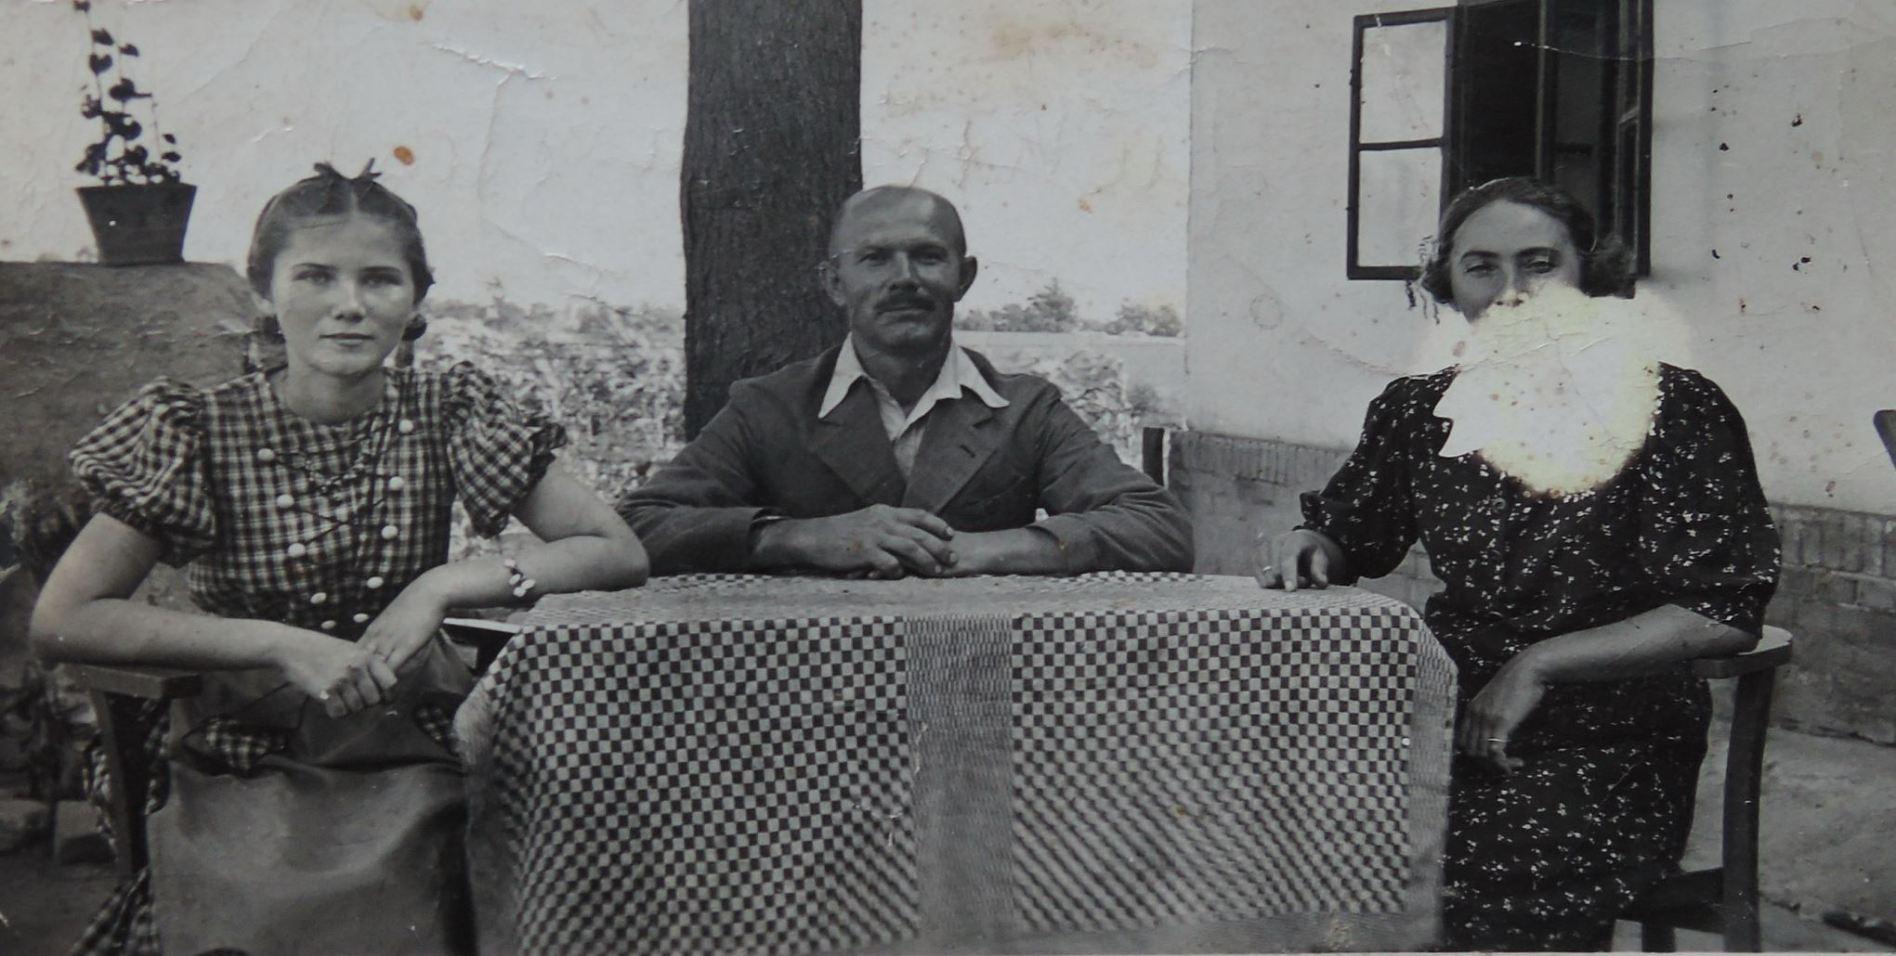 Tóth család 1938